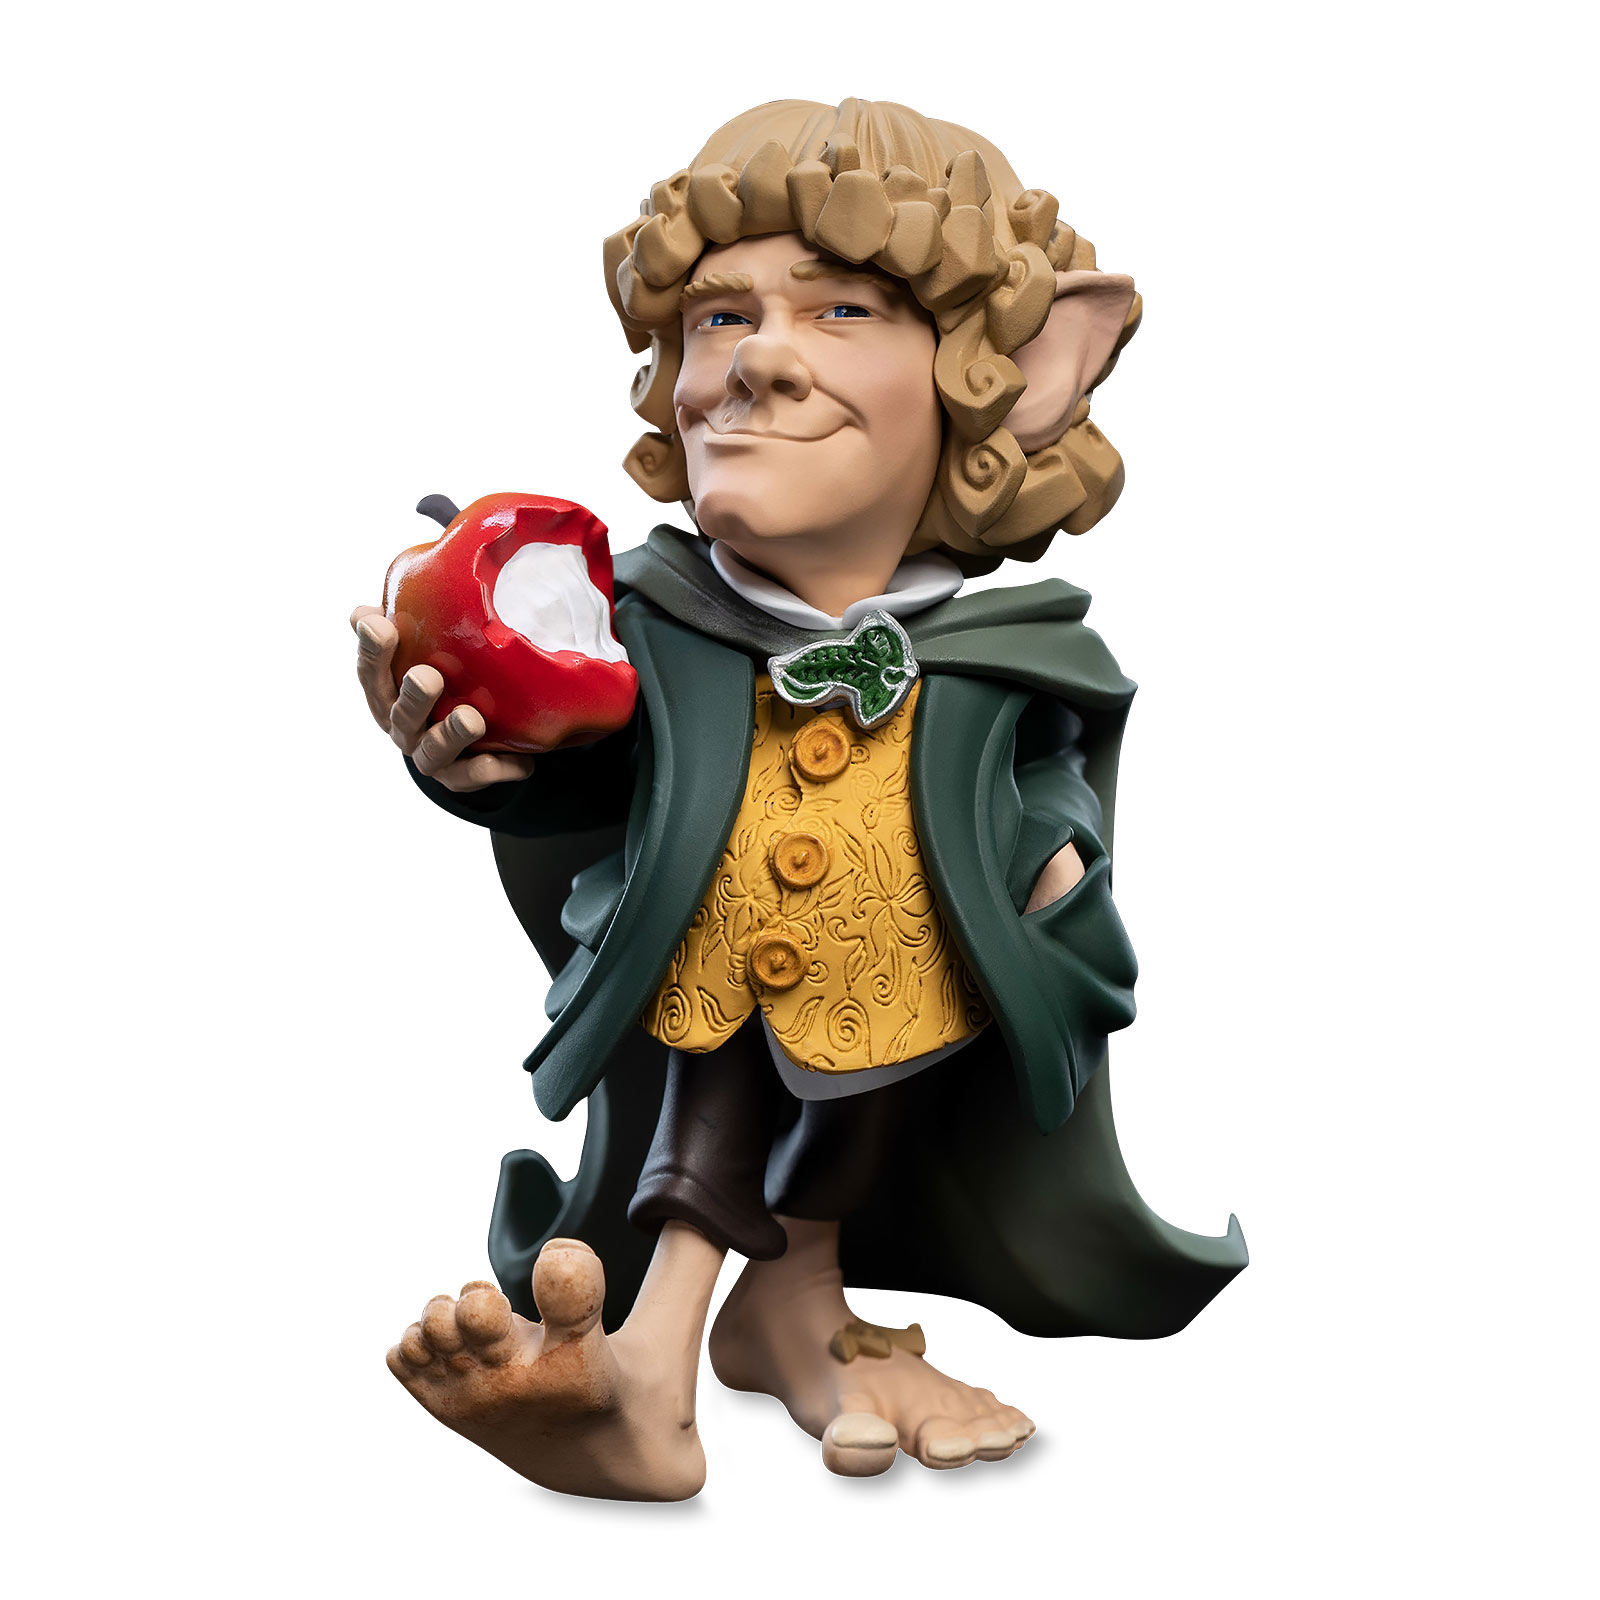 Herr der Ringe - Merry Mini Epics Figur